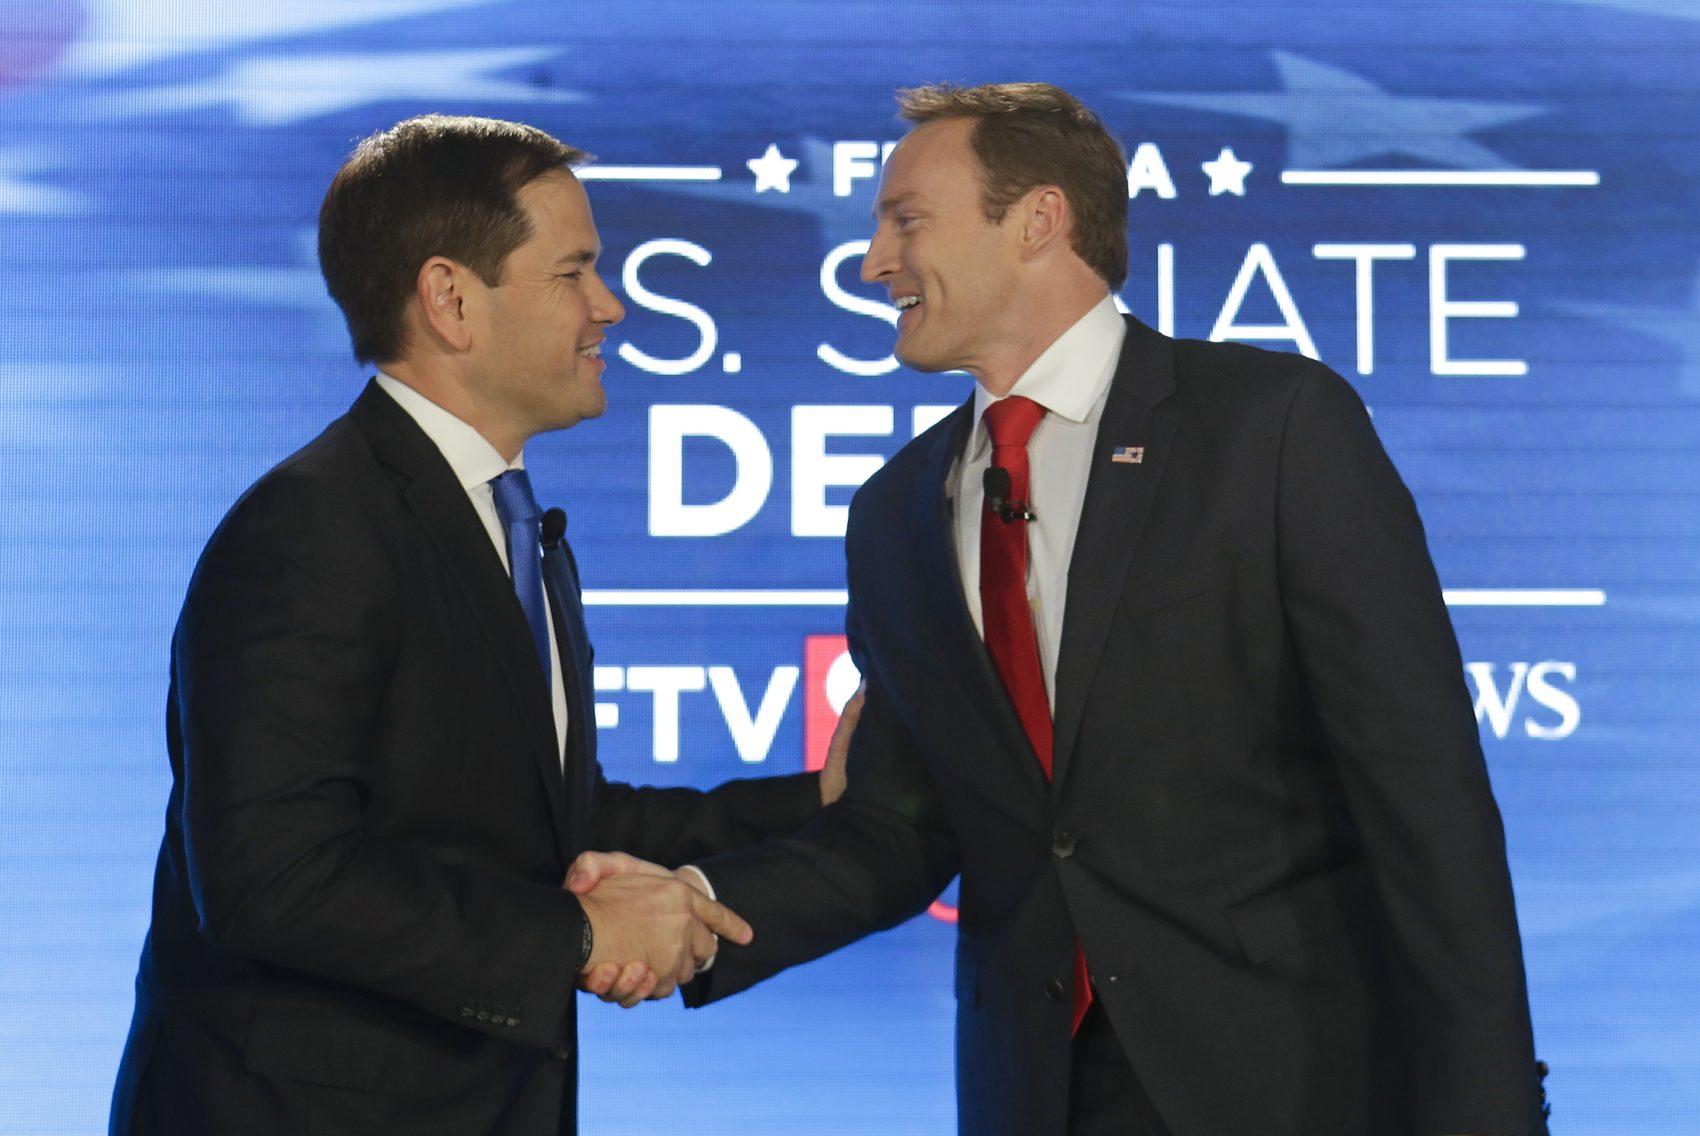 Marco-Rubio-Patrick-Murphy.jpg